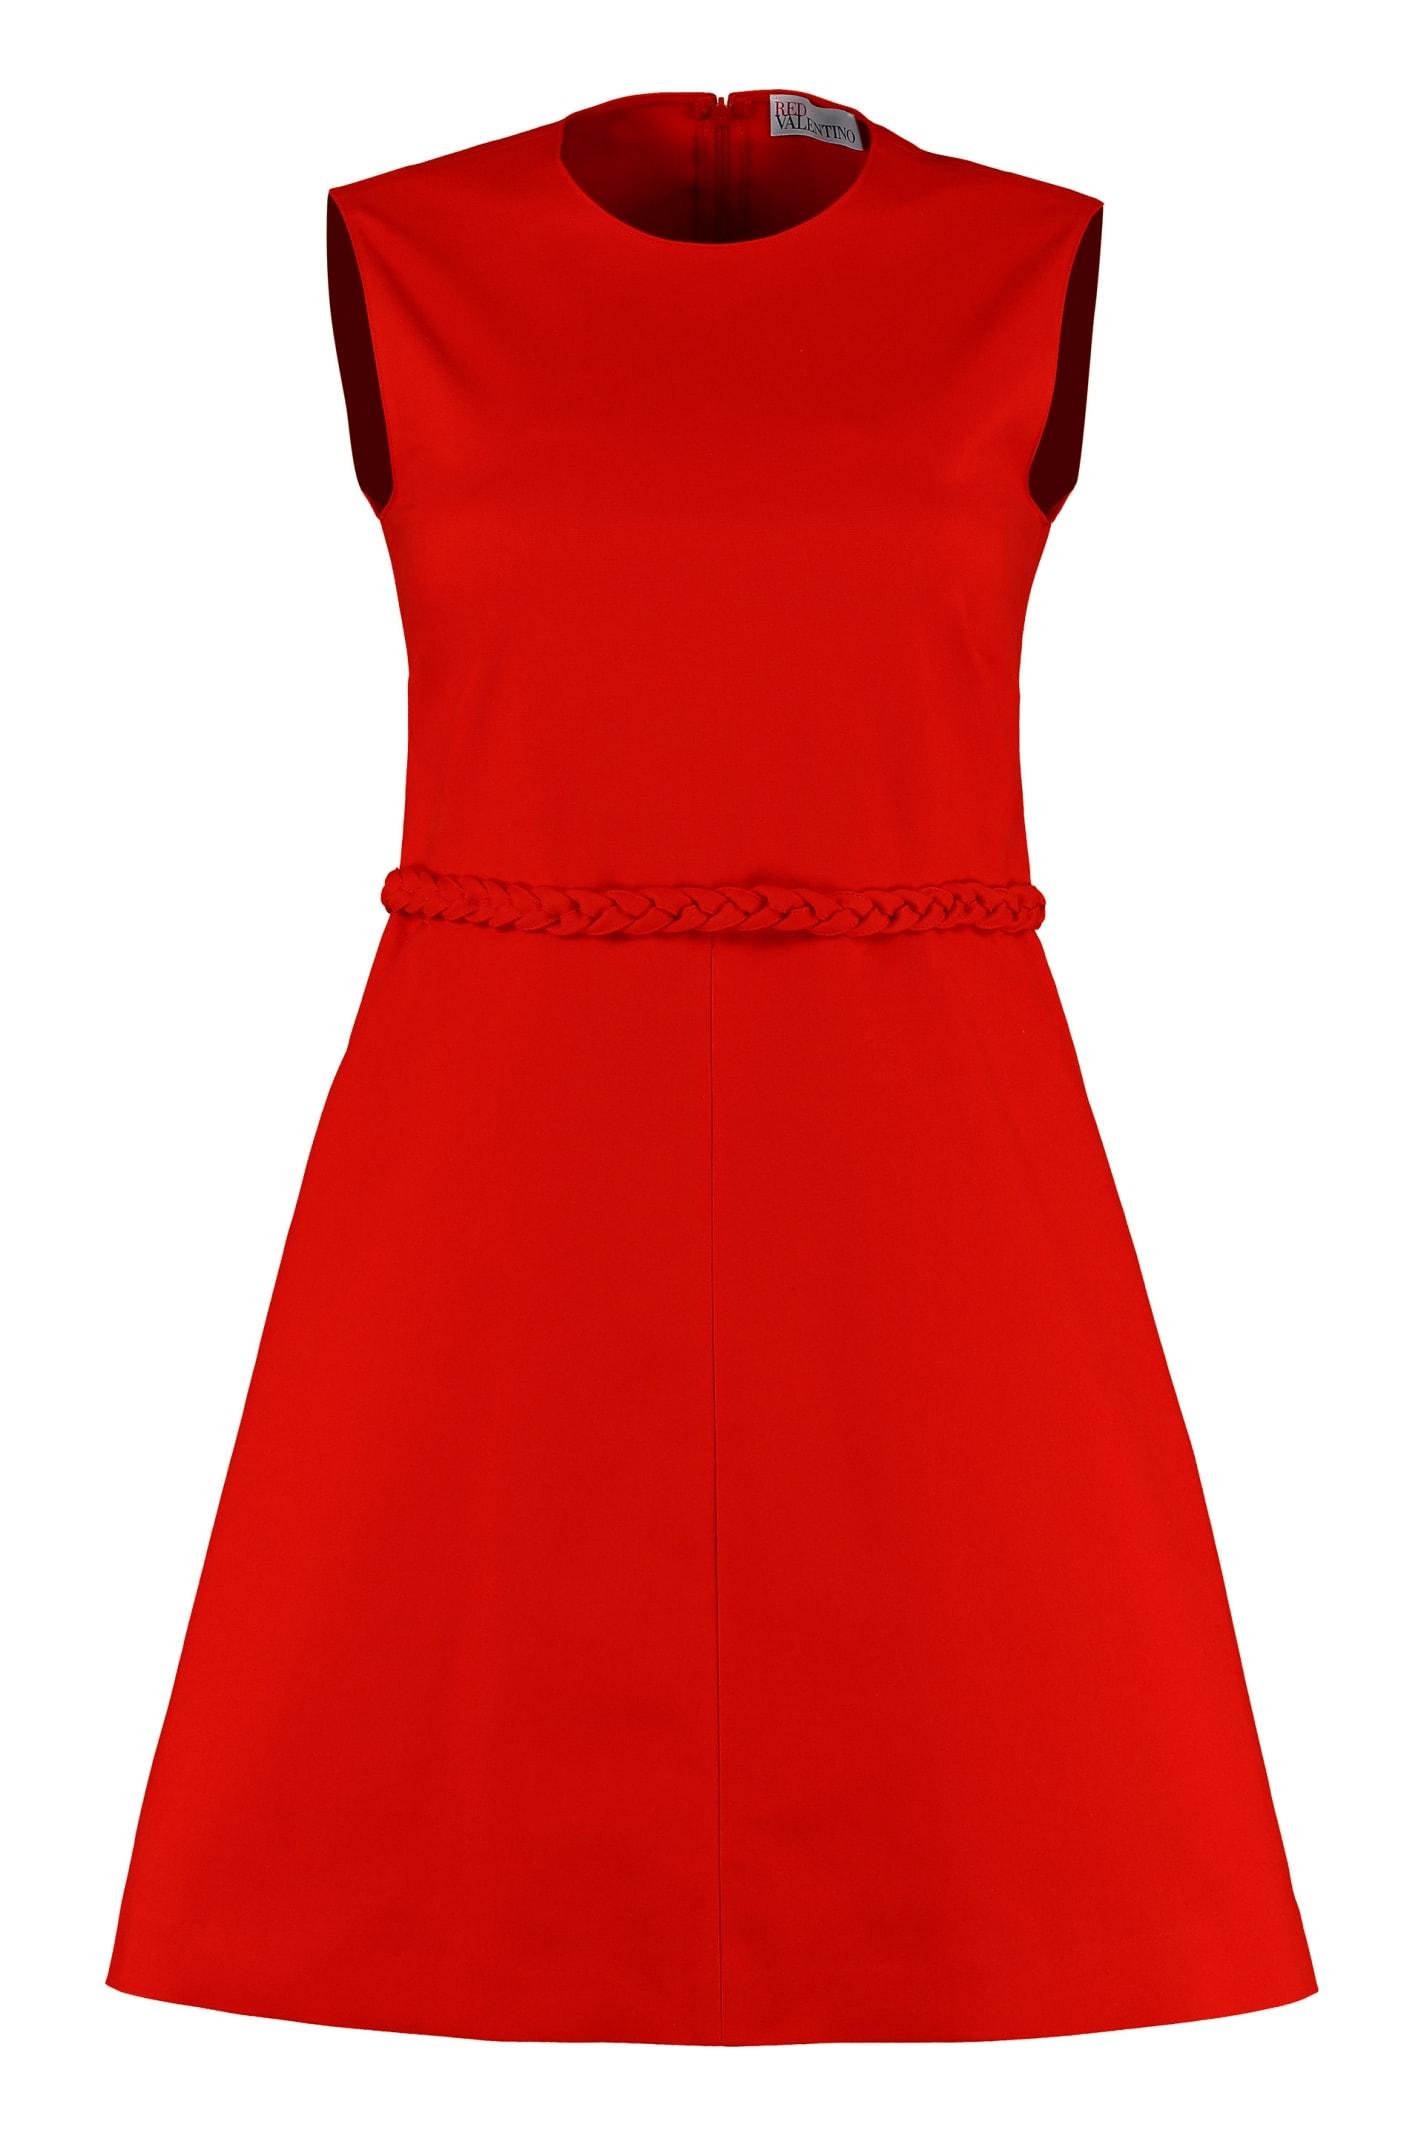 RED Valentino Stretch Cotton Mini-dress